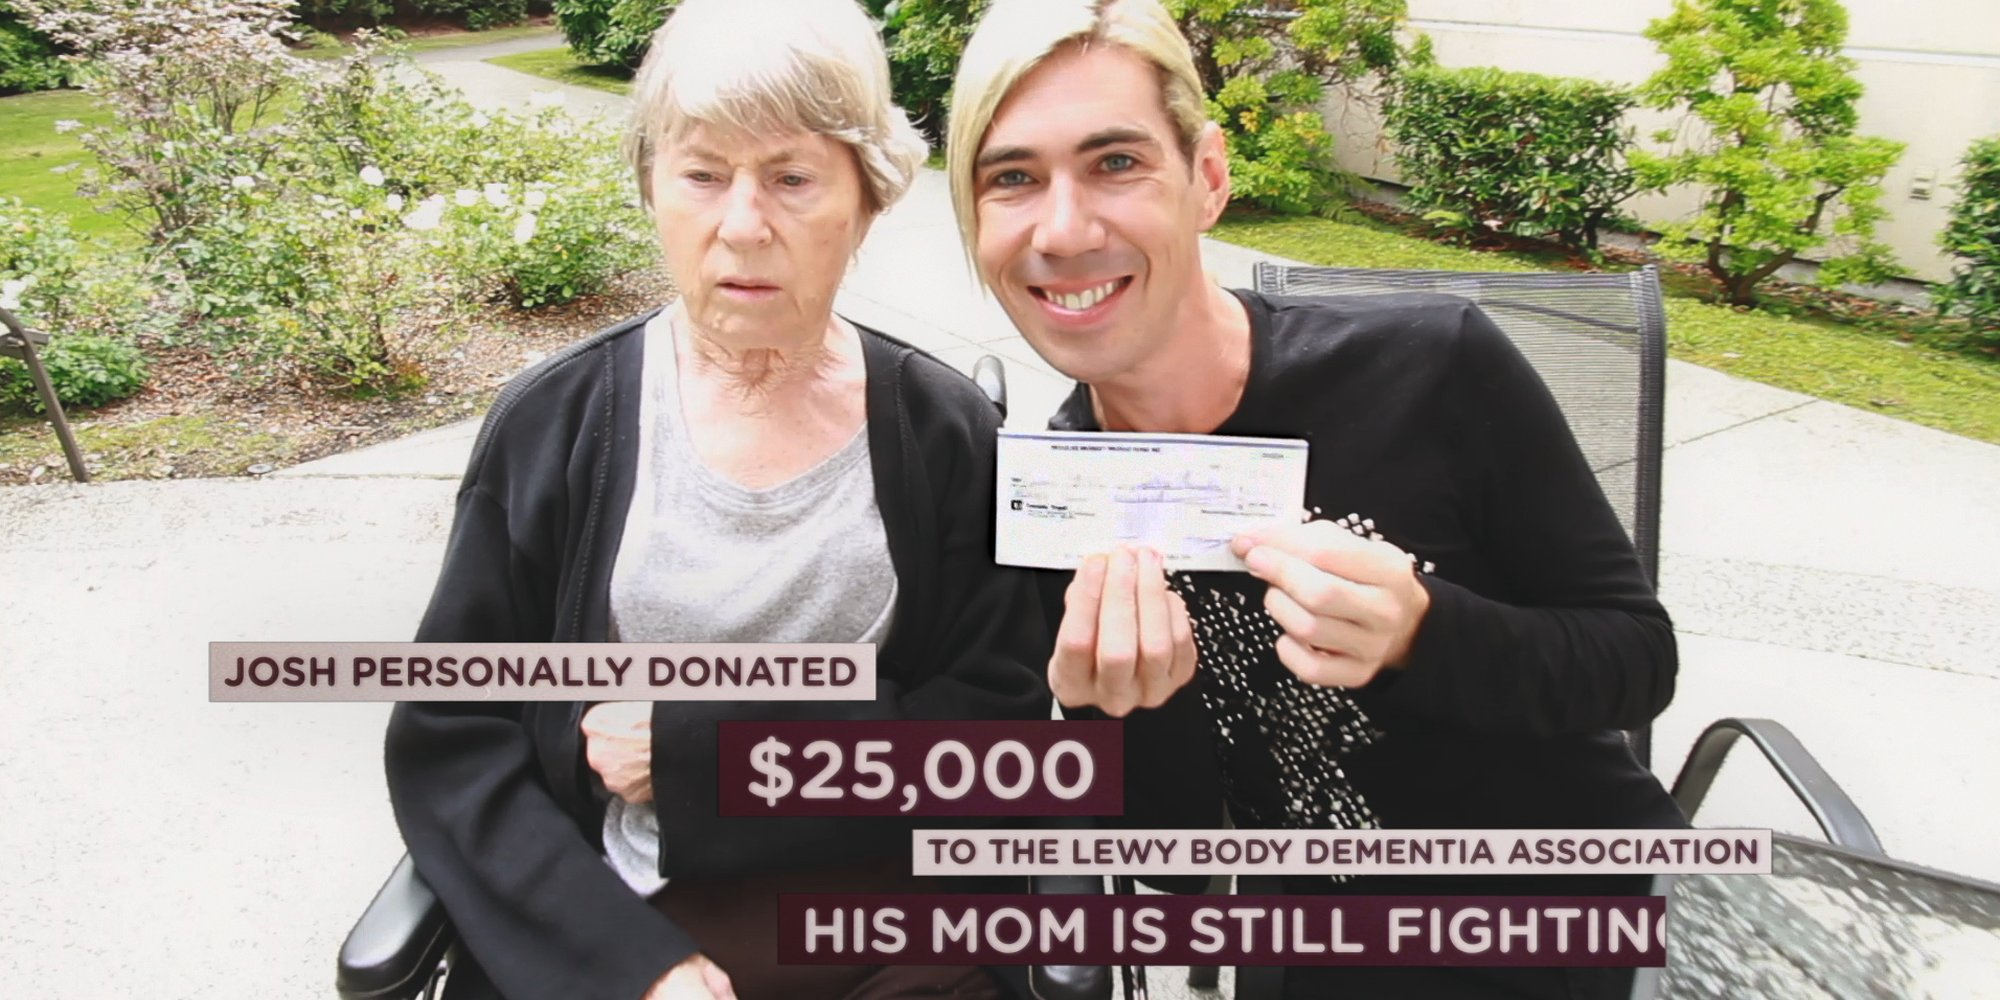 Josh personally donated 25,000 dollars to fight body dementia